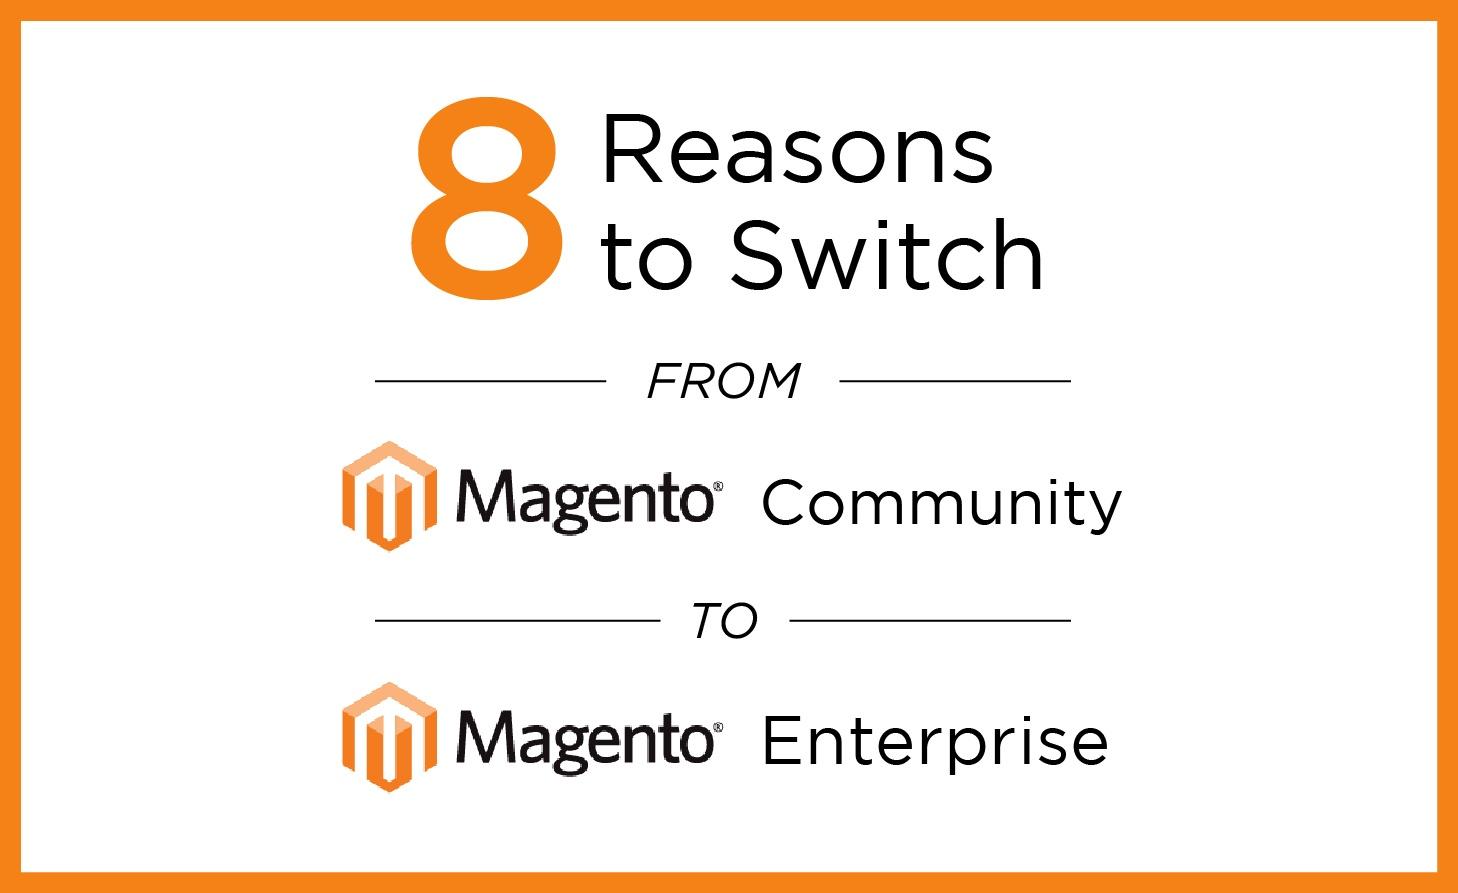 magento-community-to-enterprise